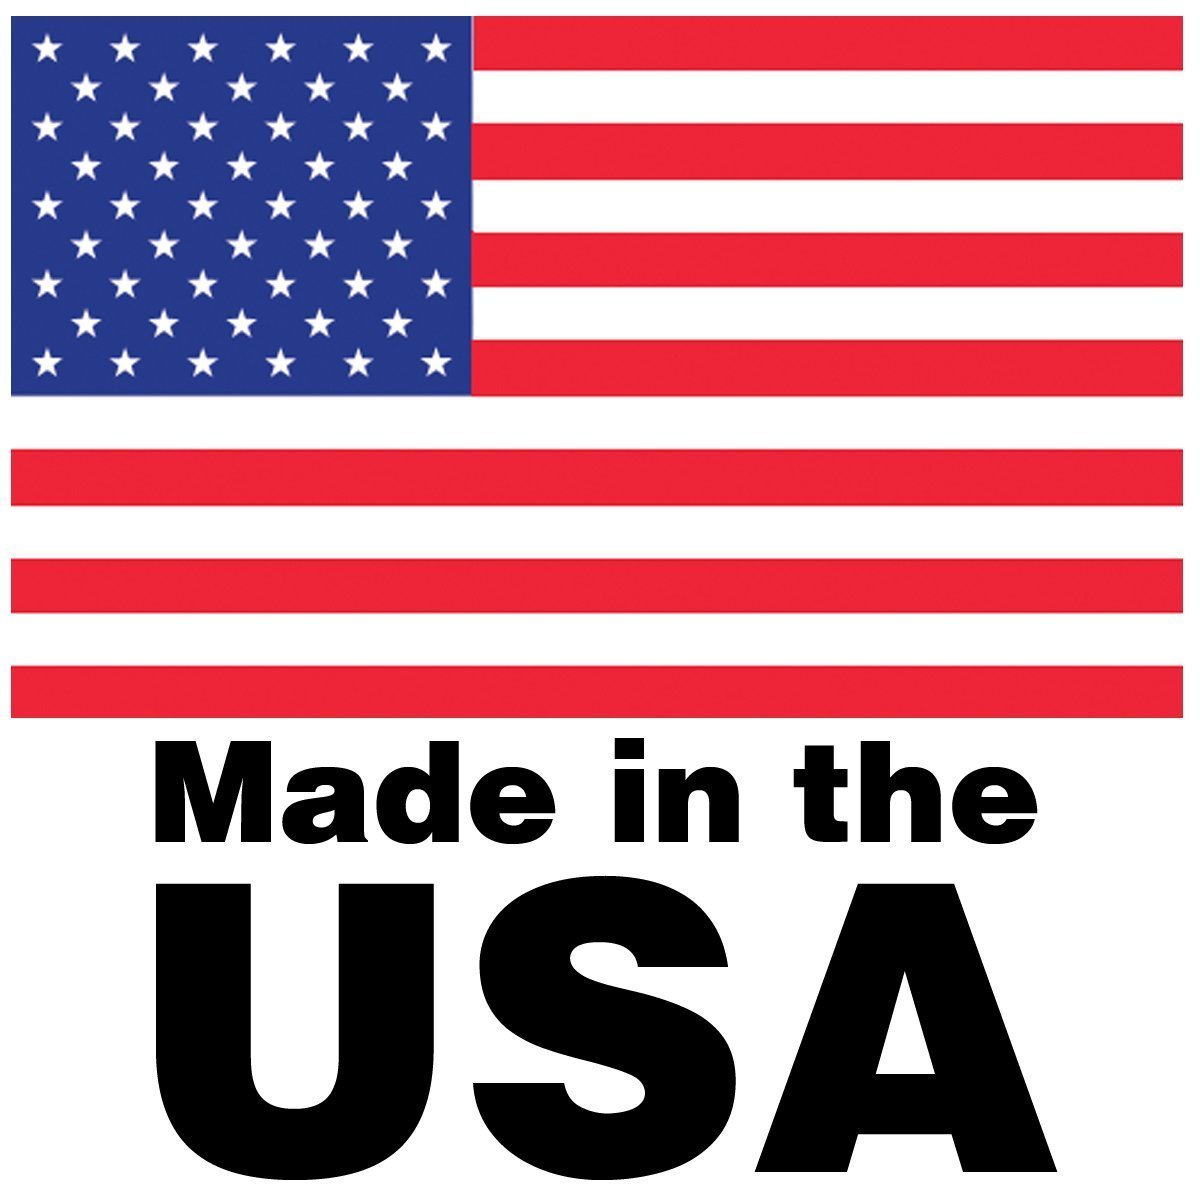 Shop-Tek / DAVIDSOIN 10-Piece 12-Inch By 24 TPI Bi-Metal Hacksaw Blades Made in USA, SAWHK-BD7 - Sold by Ucostore Only